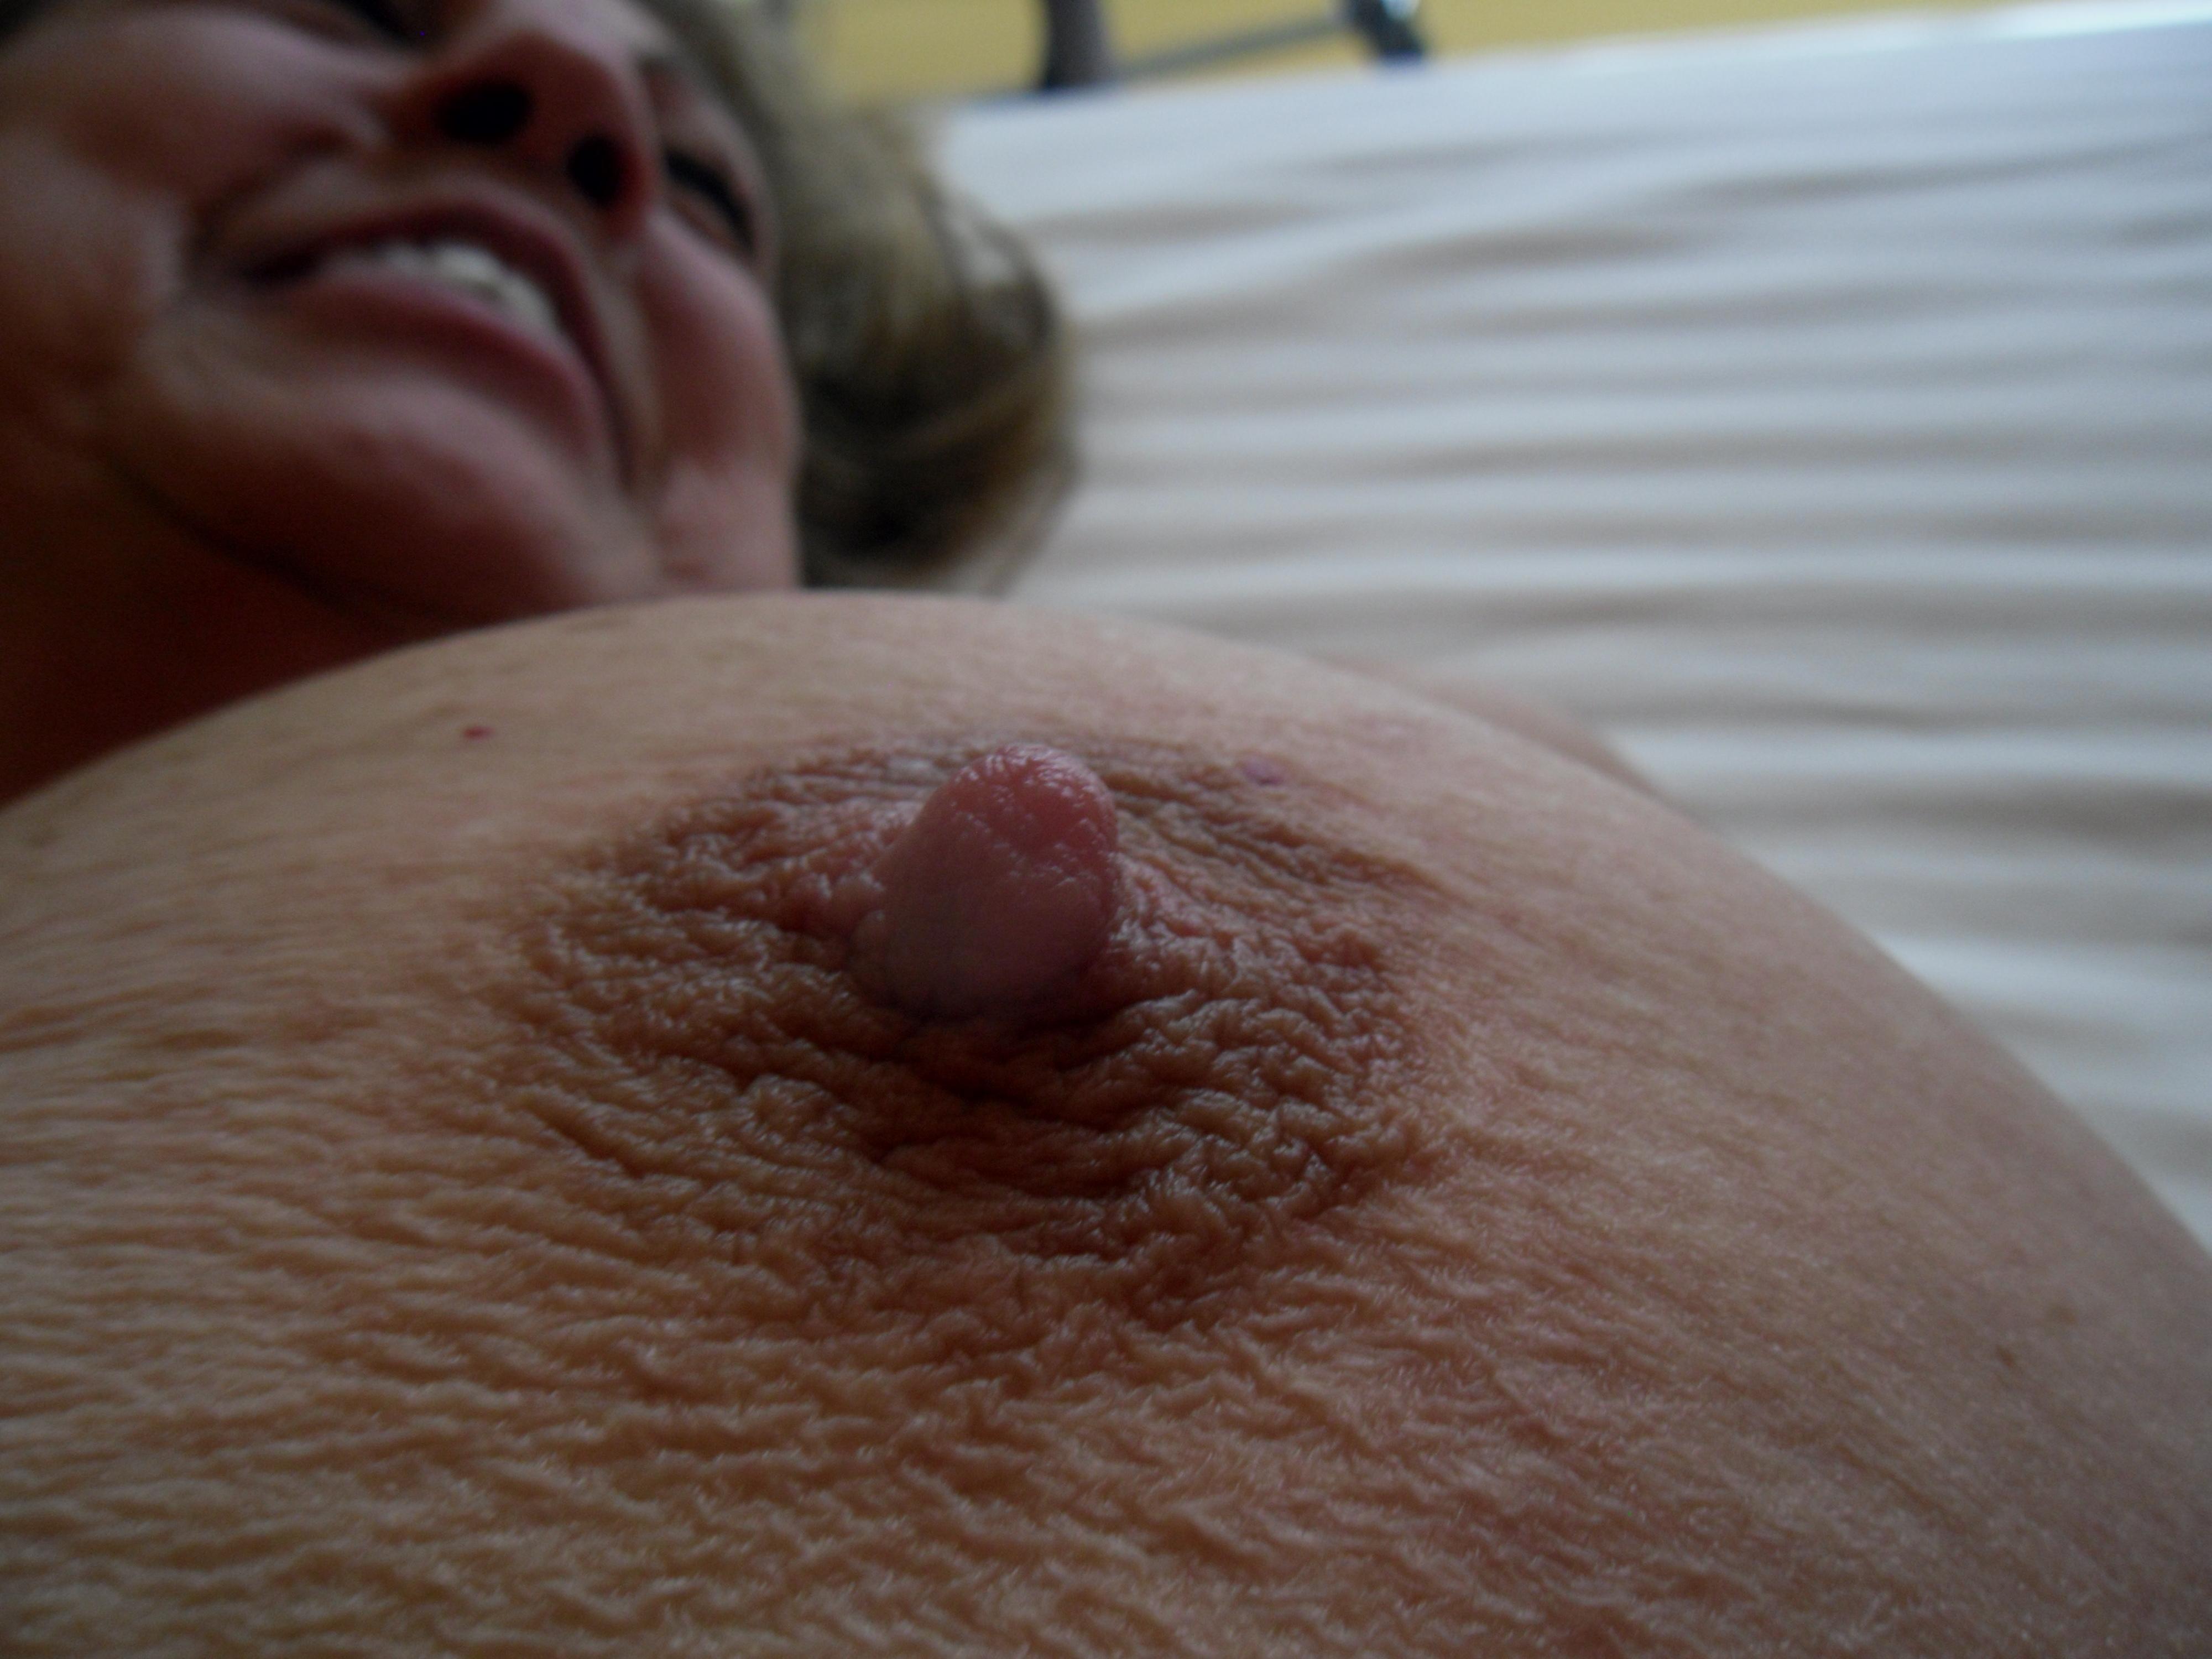 bbw hard tits - My Long Hard Nipples - BBW/Chubby On Yuvutu Homemade Amateur Porn Movies  And XXX Sex Videos